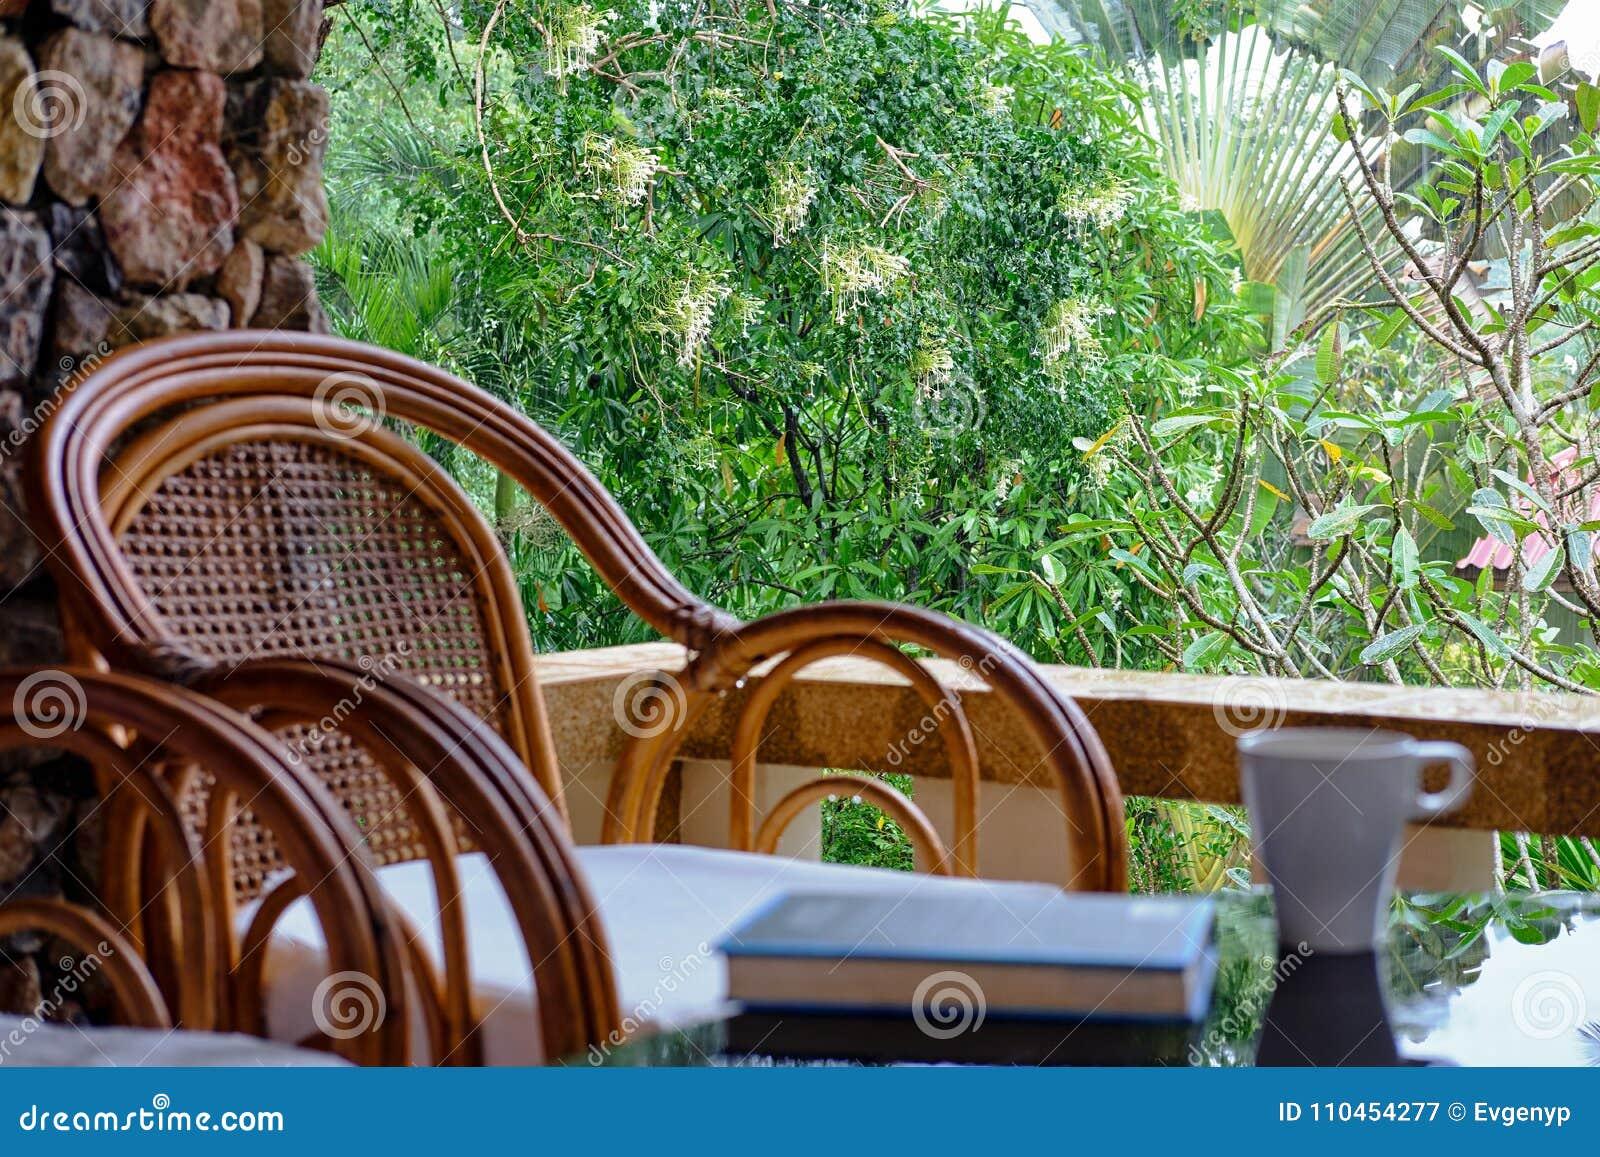 Vide- stol på balkong, koppen kaffe och boken